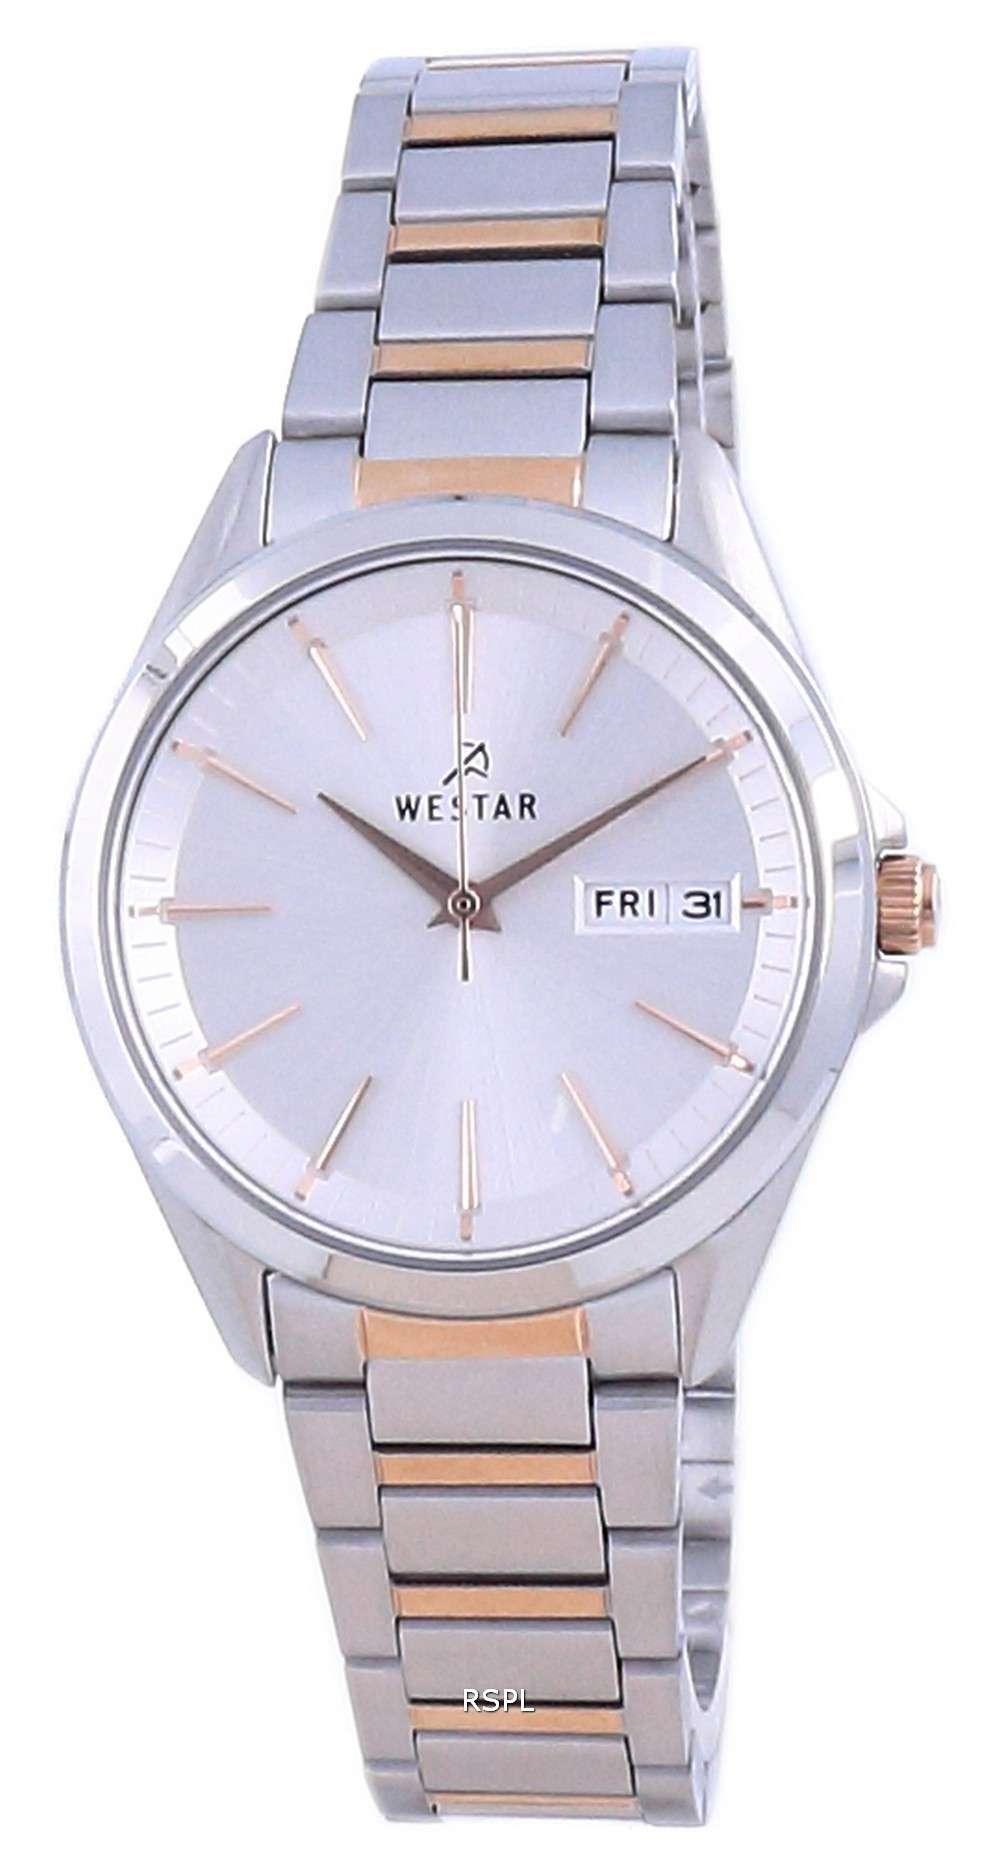 Westar Silver Dial Two Tone Stainless Steel Quartz 40212 SPN 607 Reloj para mujer